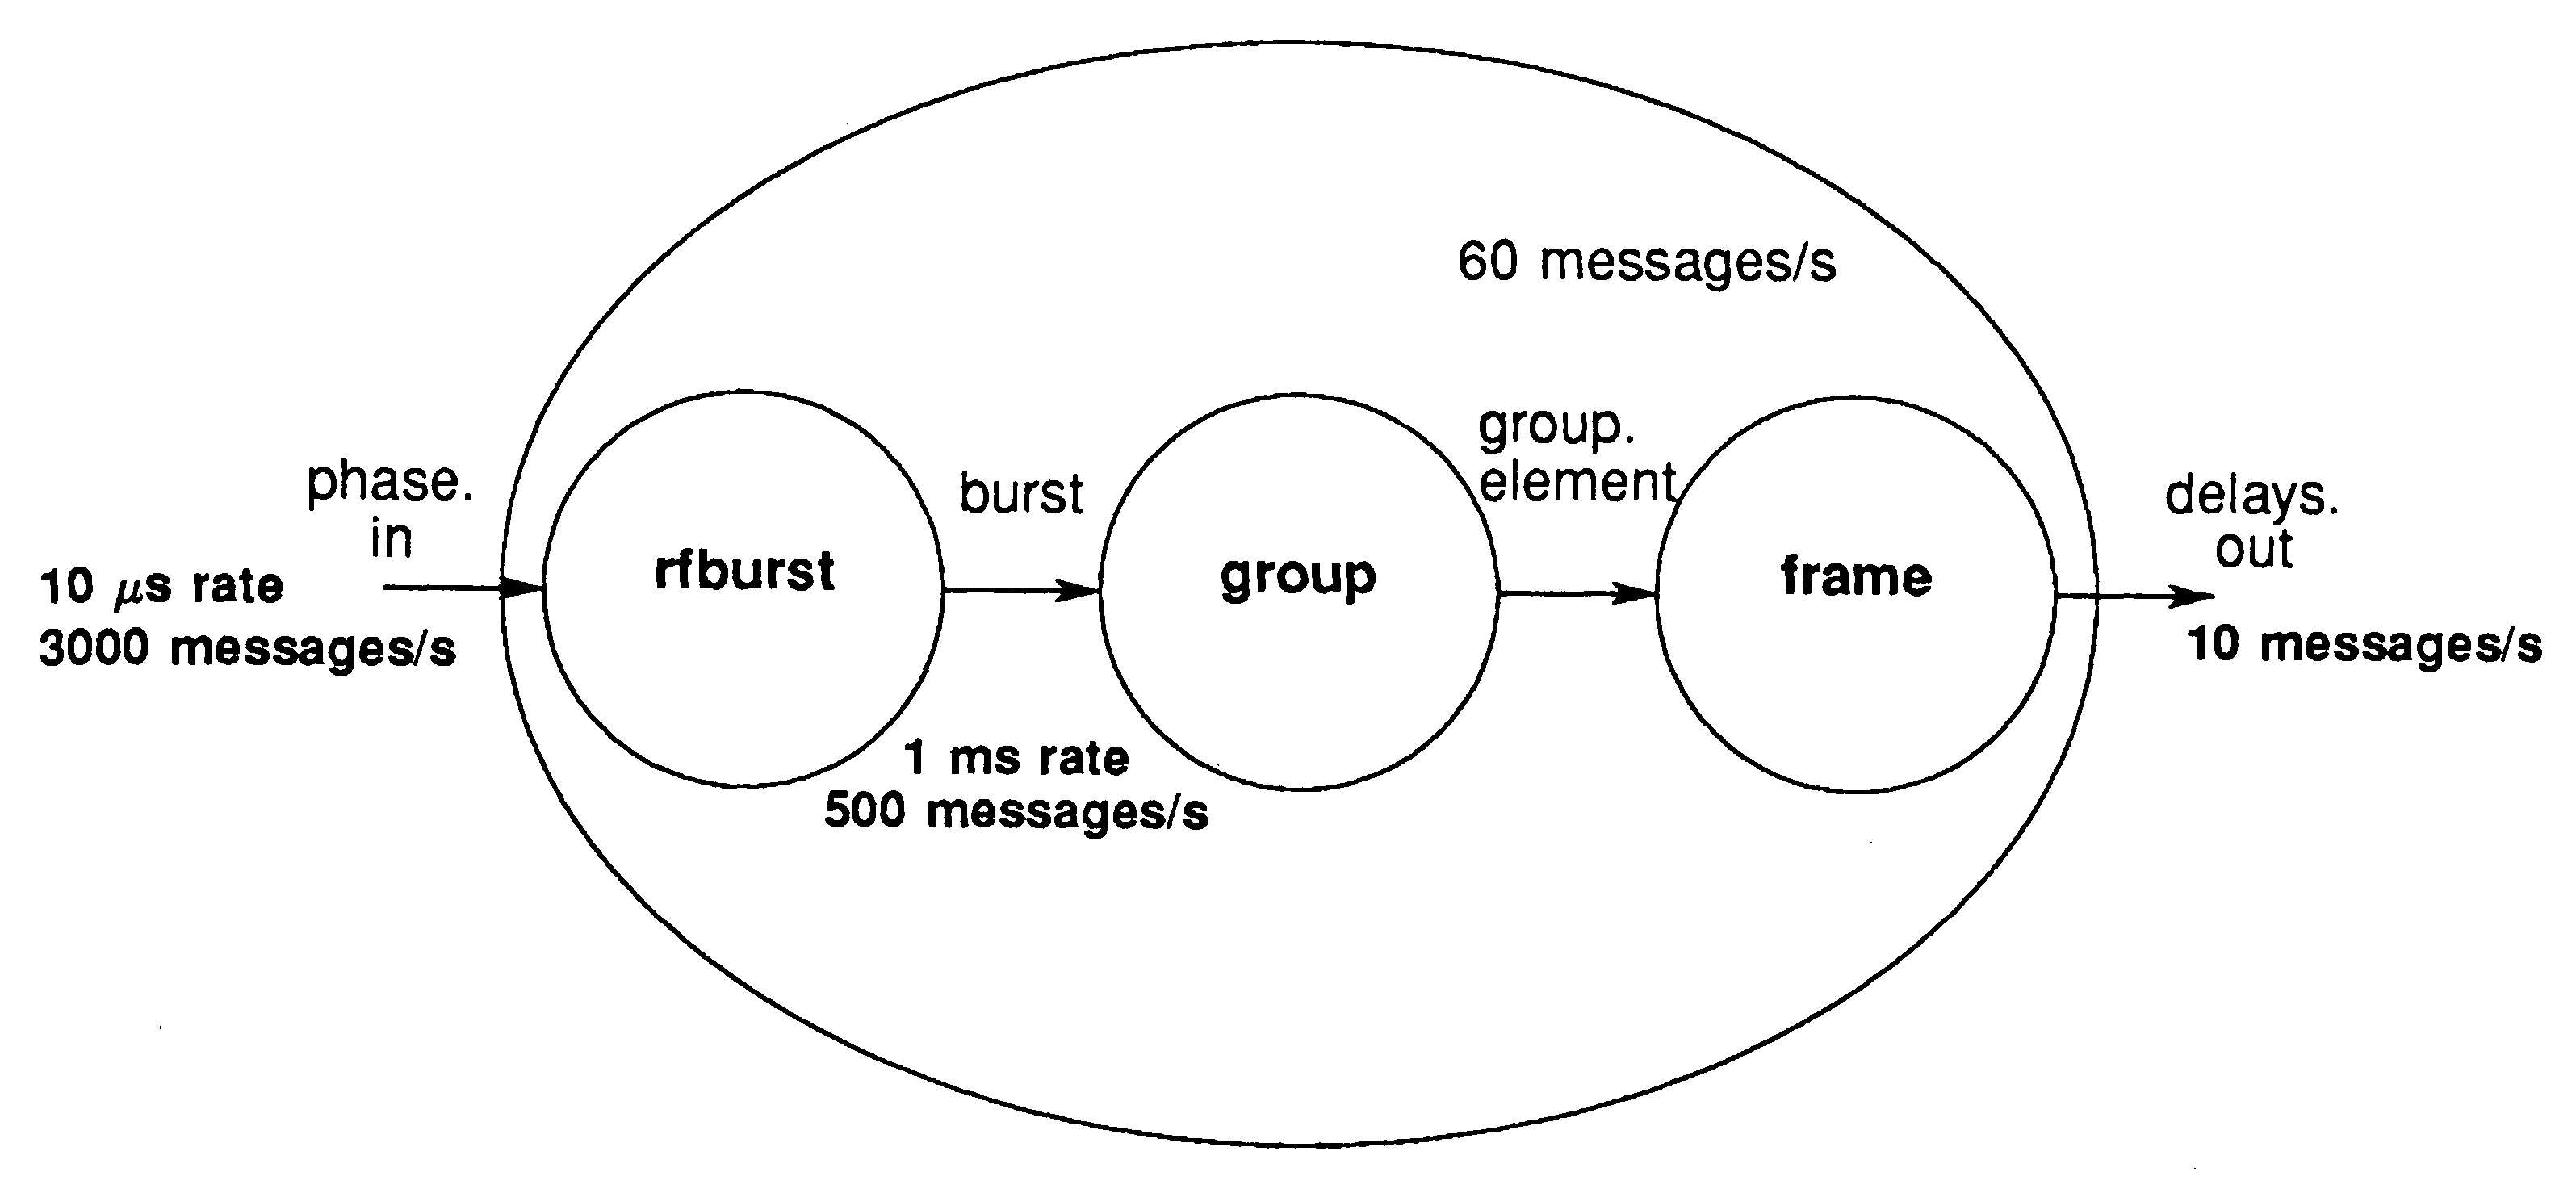 sub processes for signal processing sub processes for signal processing